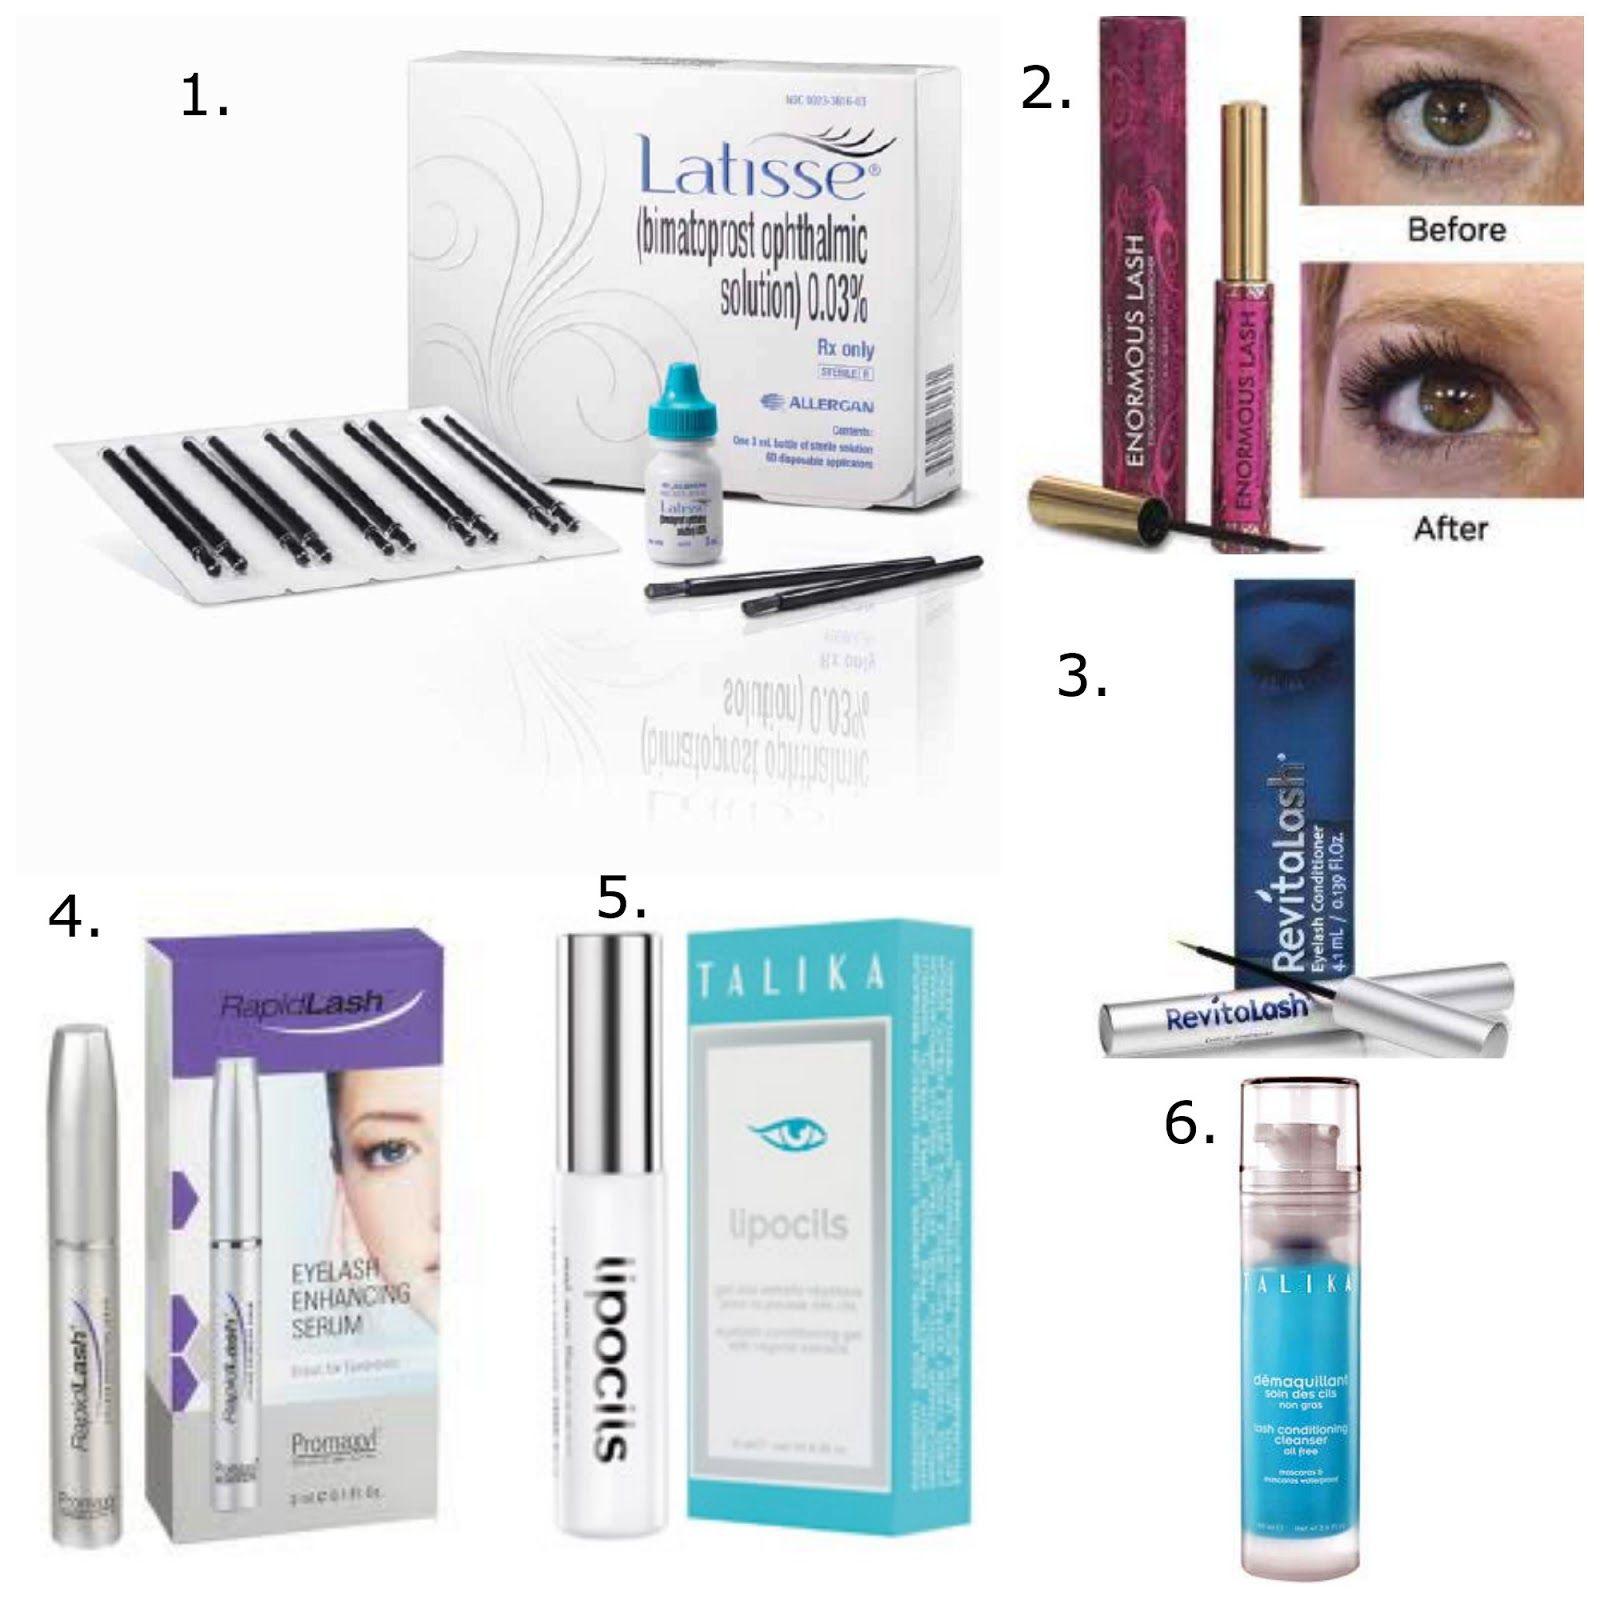 Top 5 Eyelash Growth Product Reviews   Eyelashes, Beauty ...